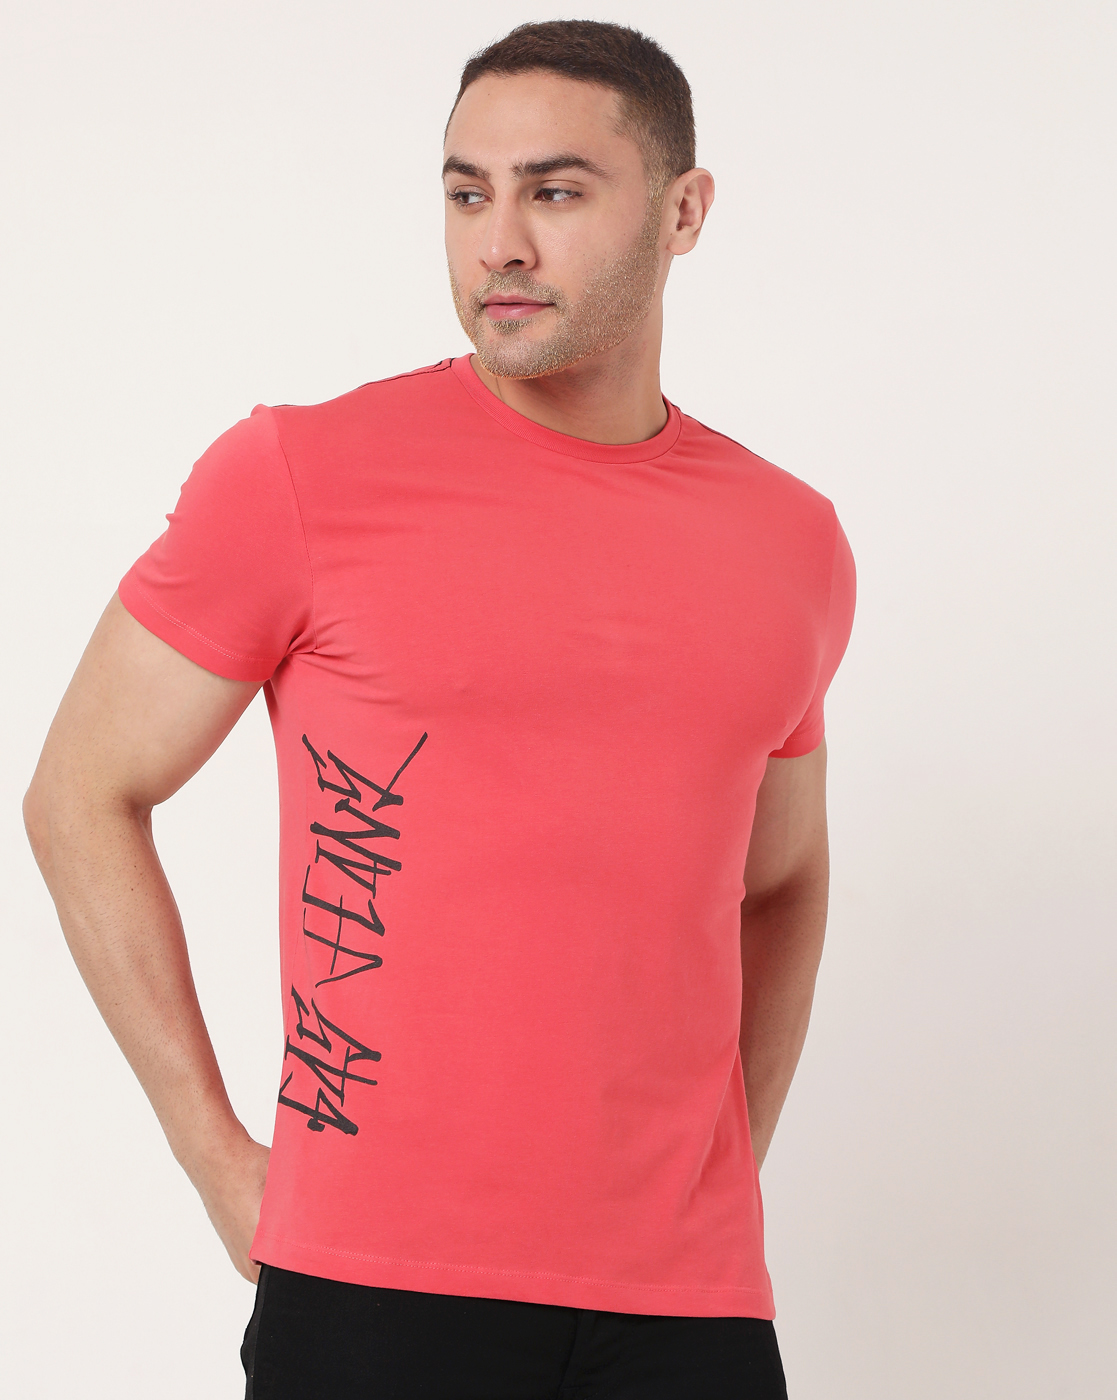 GAS | Men's Scuba Scrib Ec In Slim Fit Printed Tshirt